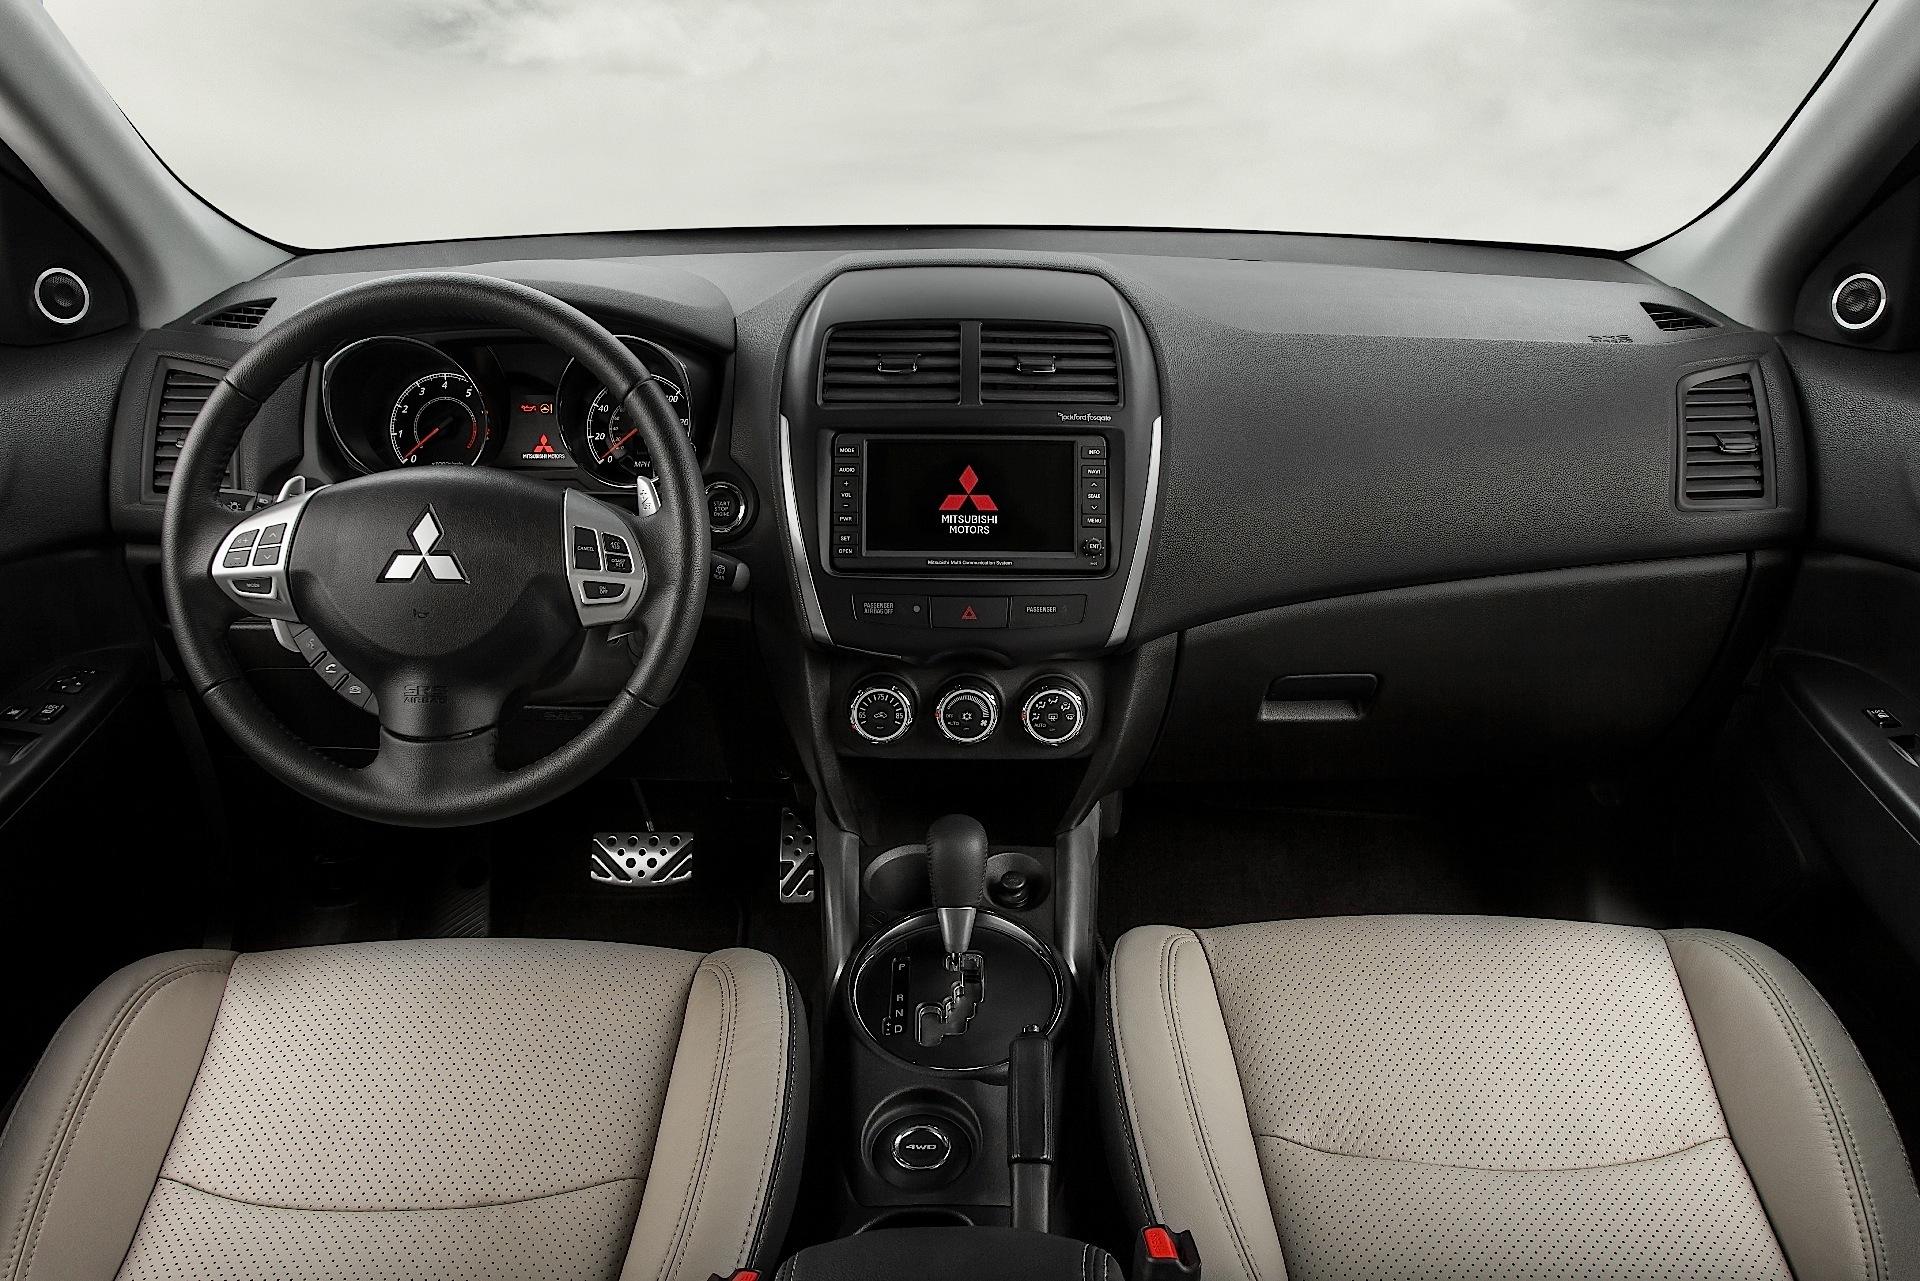 2013 Mitsubishi Outlander Sport Limited Edition